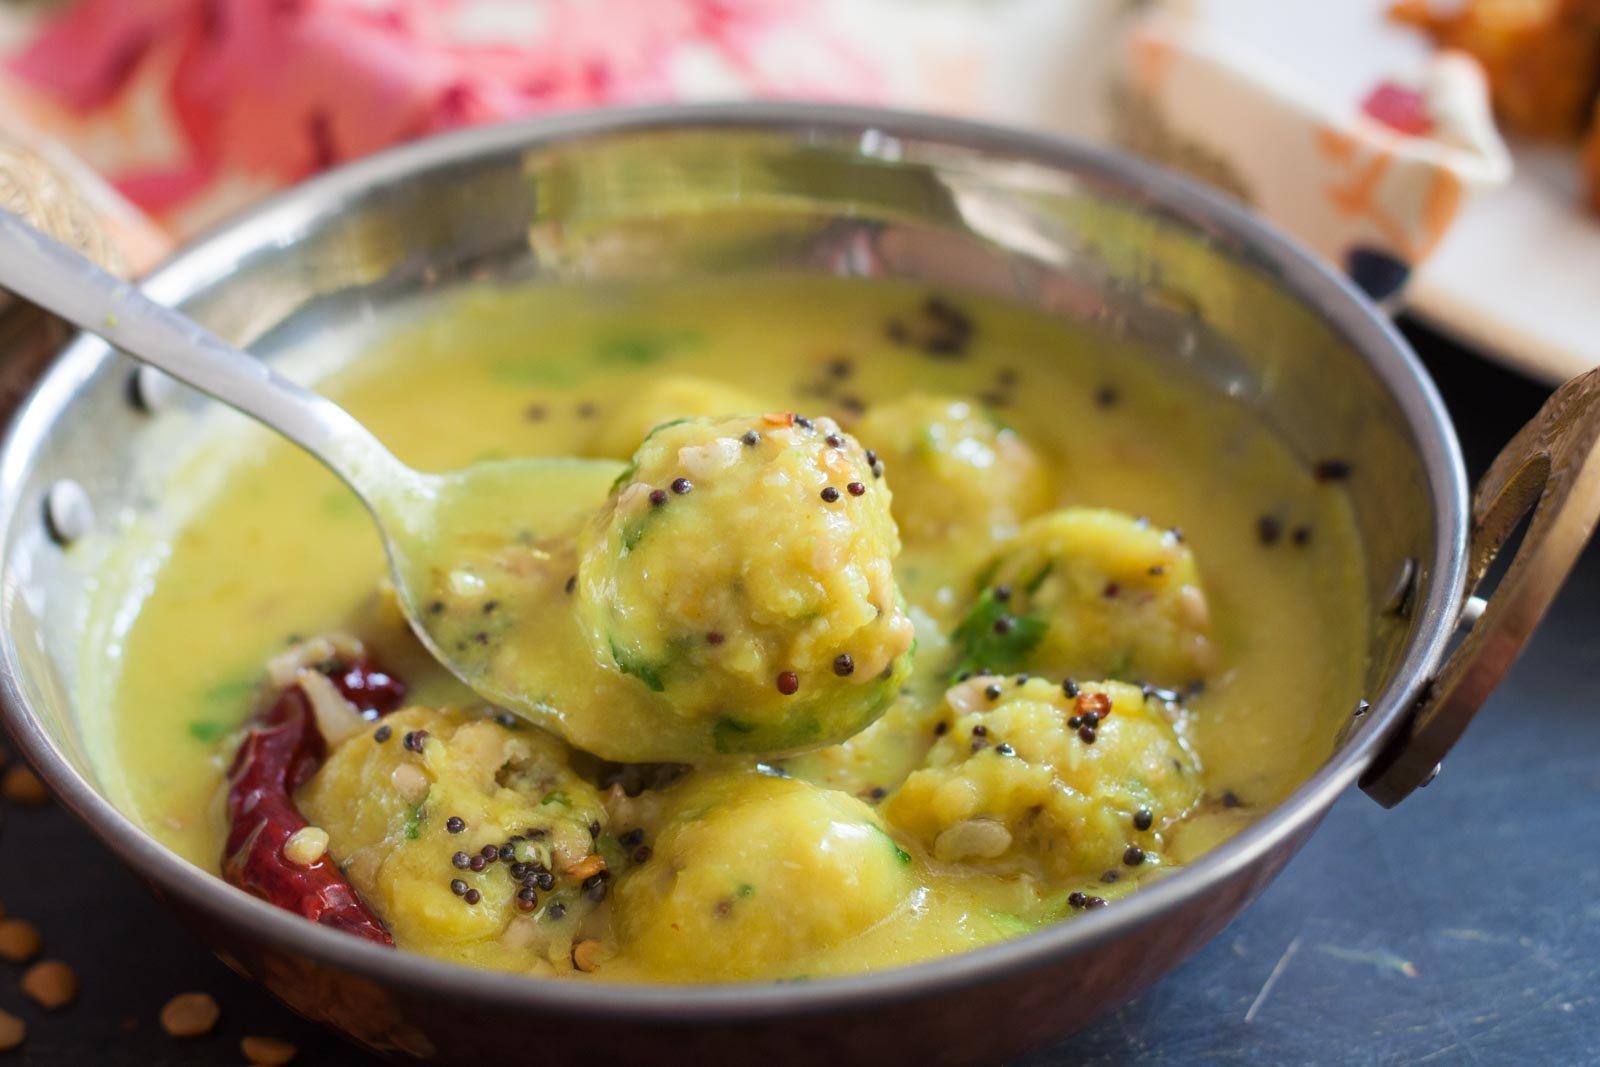 Karnataka style sandige huli recipe toor dal dumplings in gravy karnataka style sandige huli recipe toor dal dumplings in gravy recipe forumfinder Choice Image